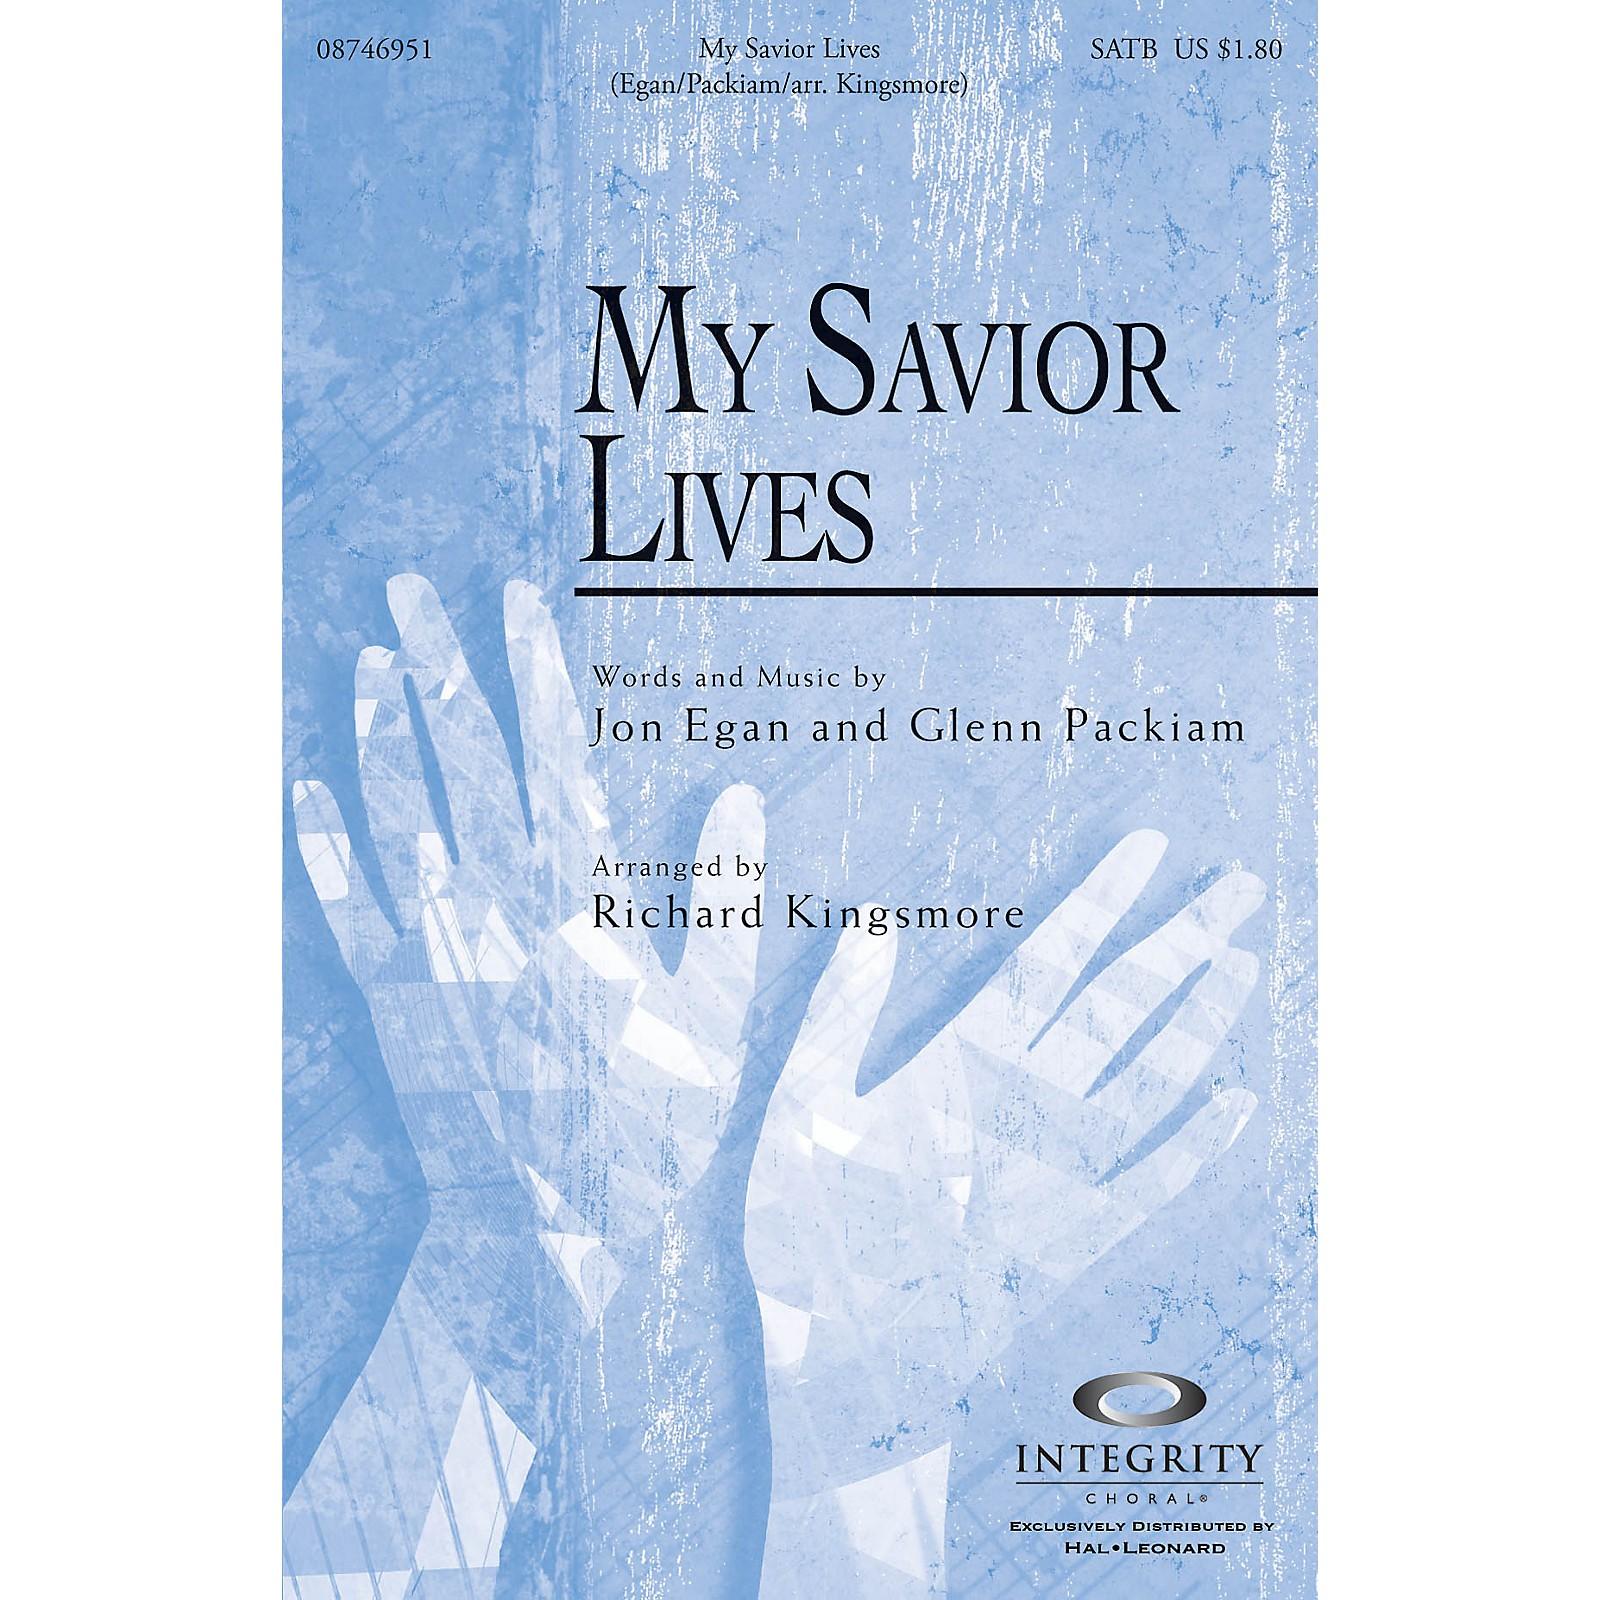 Integrity Music My Savior Lives SATB Arranged by Richard Kingsmore